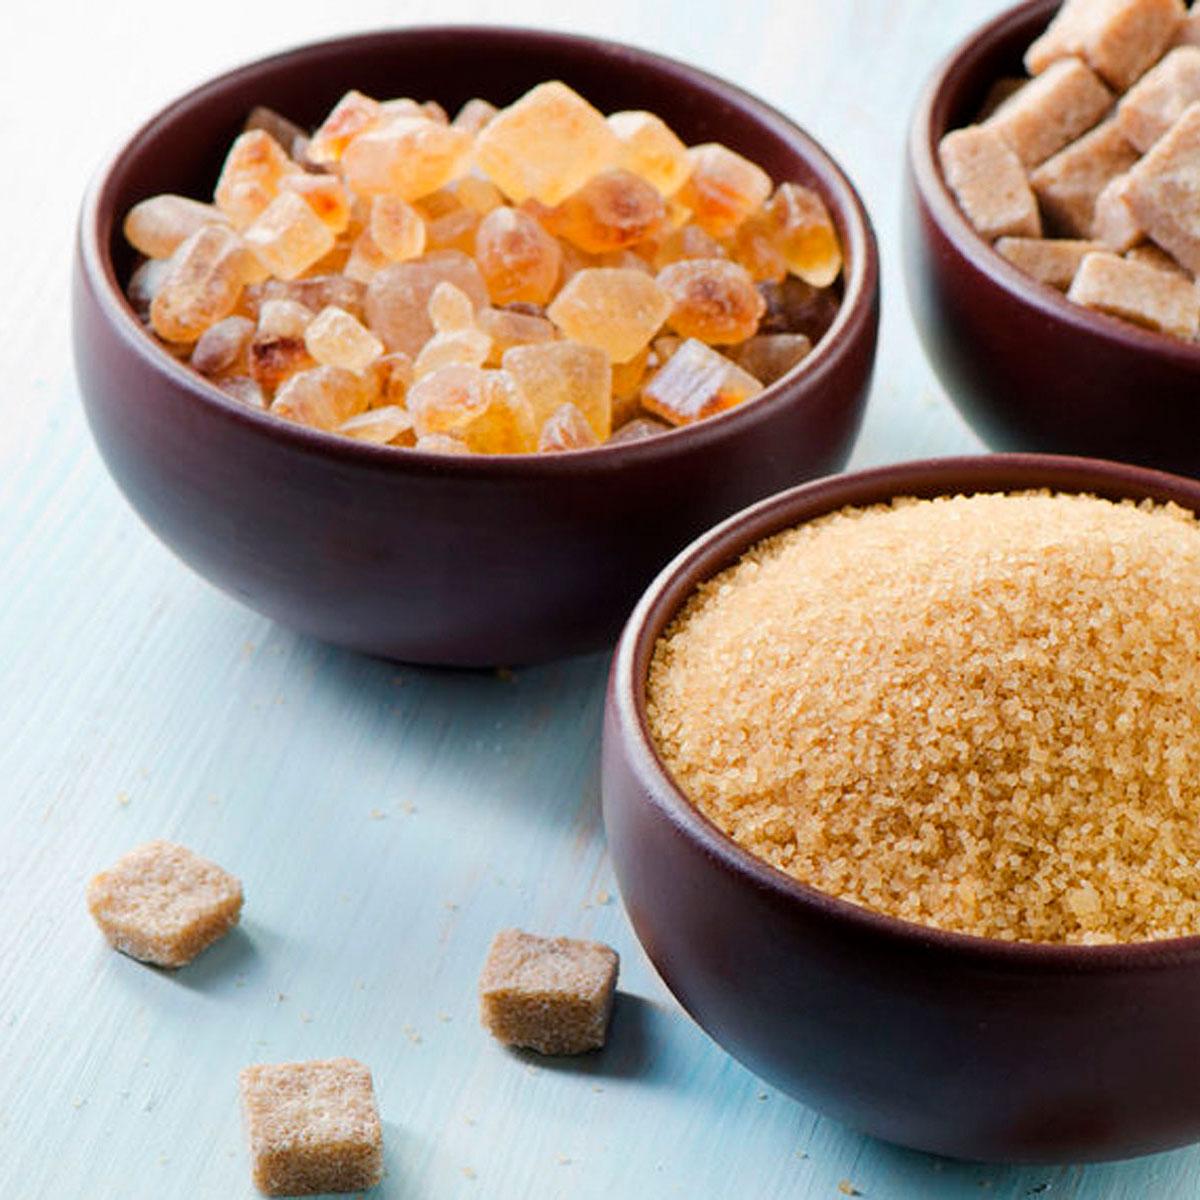 Alternativas al azúcar blanco: endulzantes naturales